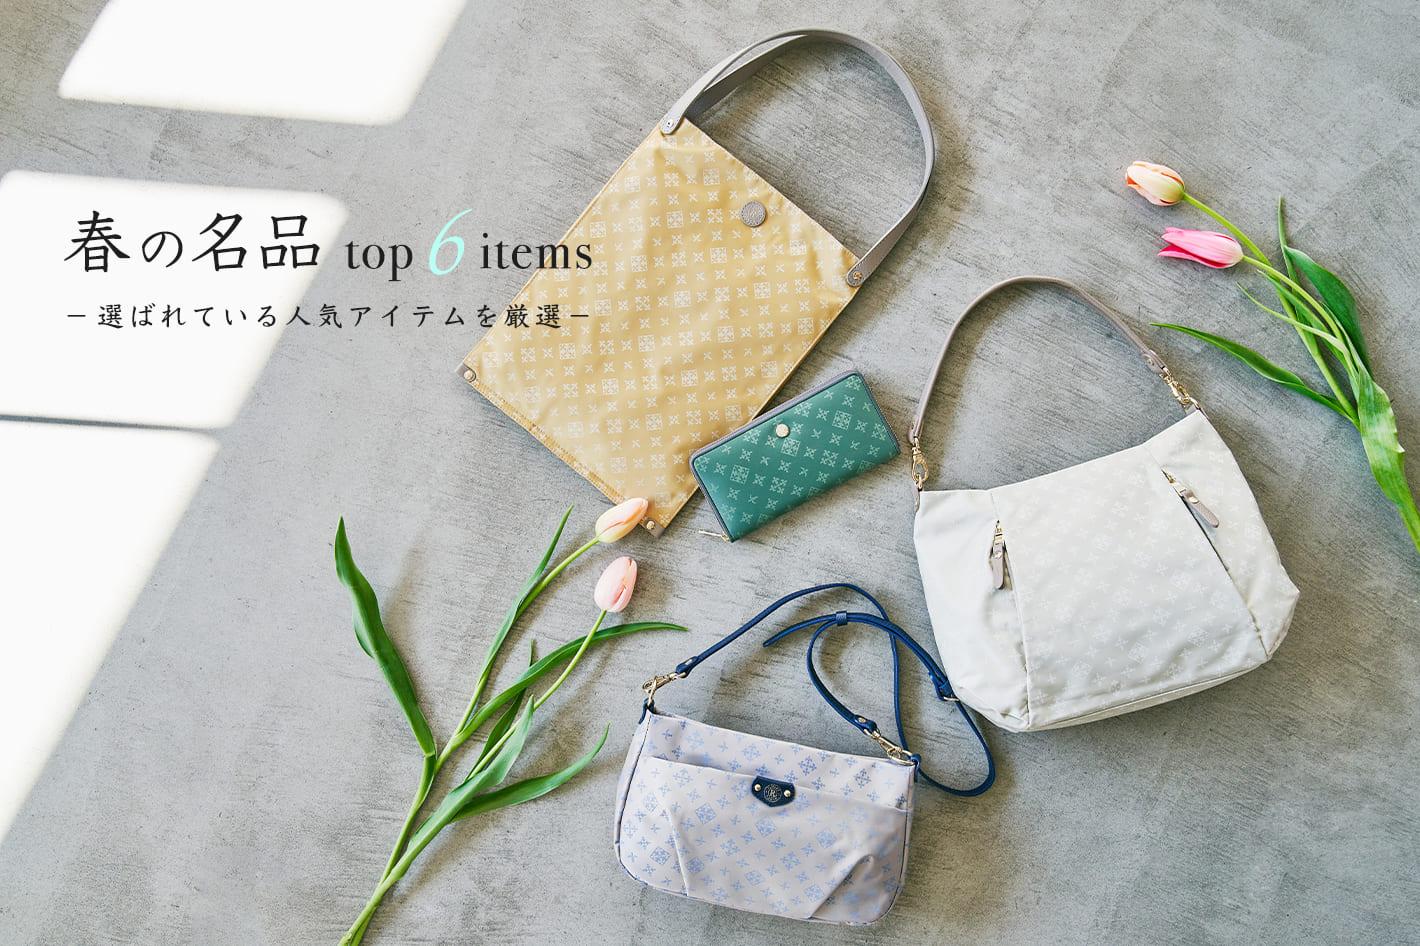 russet 春の名品 top 6 items